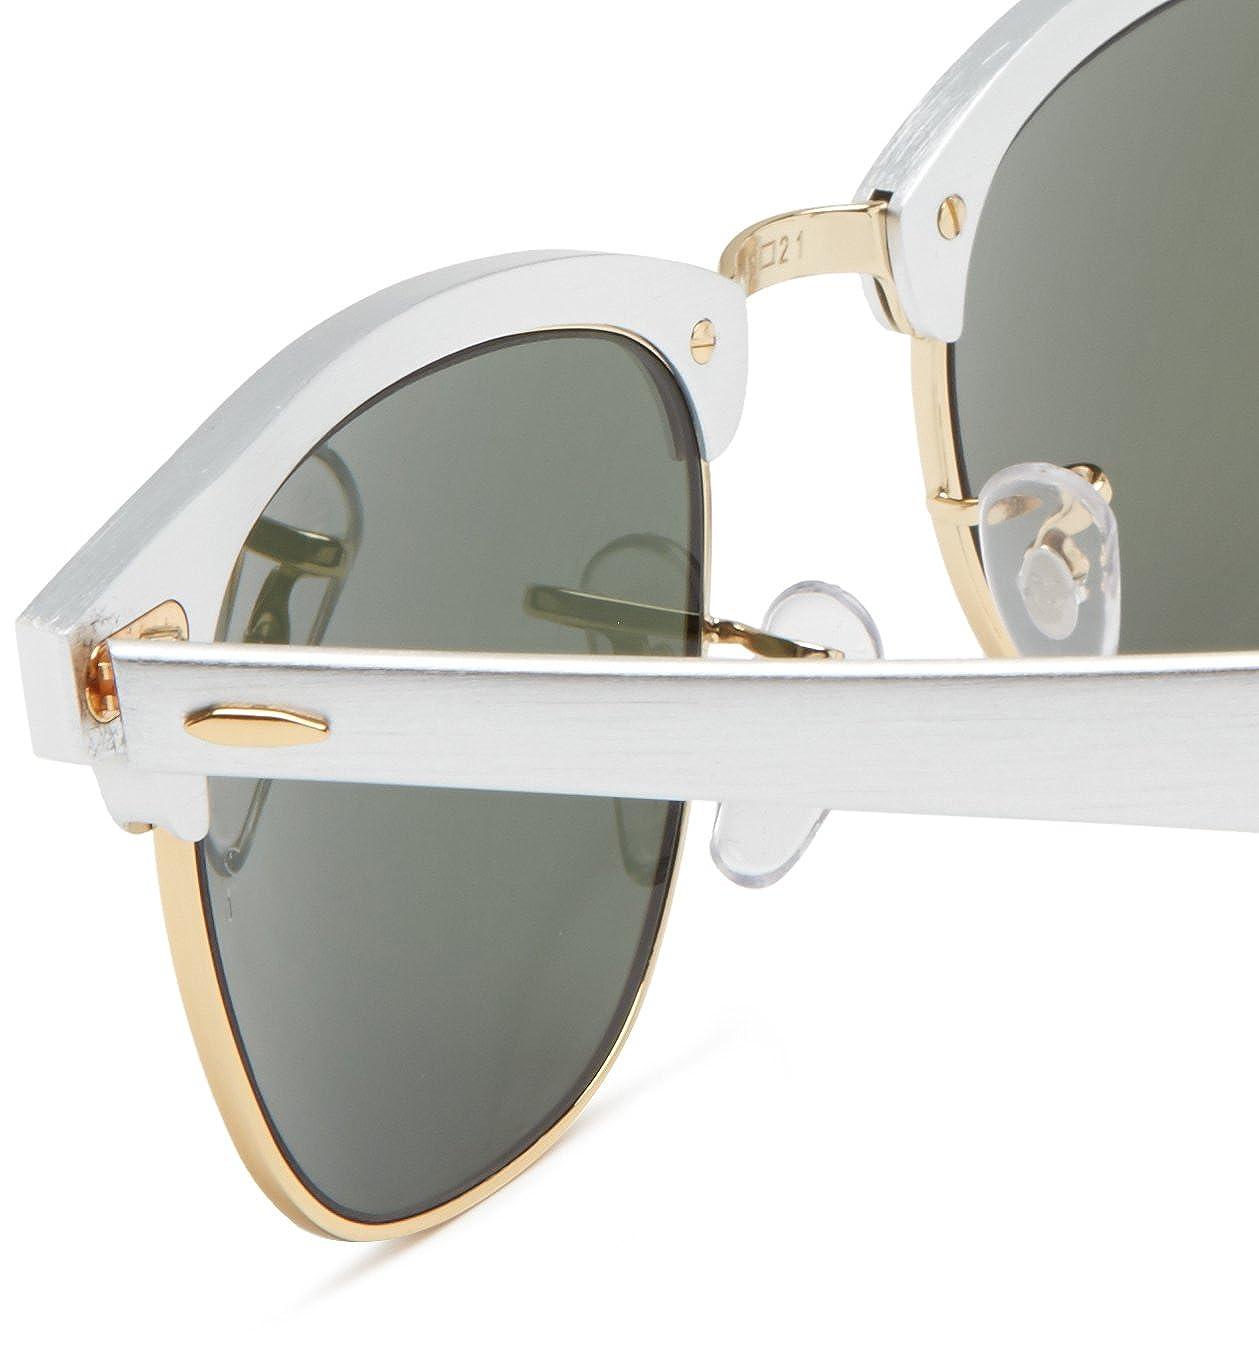 46399b49e5648 Amazon.com  Ray-Ban RB3507 137 40 CLUBMASTER ALUMINUM - BRUSHED SILVER  ARISTA Frame GREY MIRROR Lenses 51mm Non-Polarized  Ray-Ban  Clothing